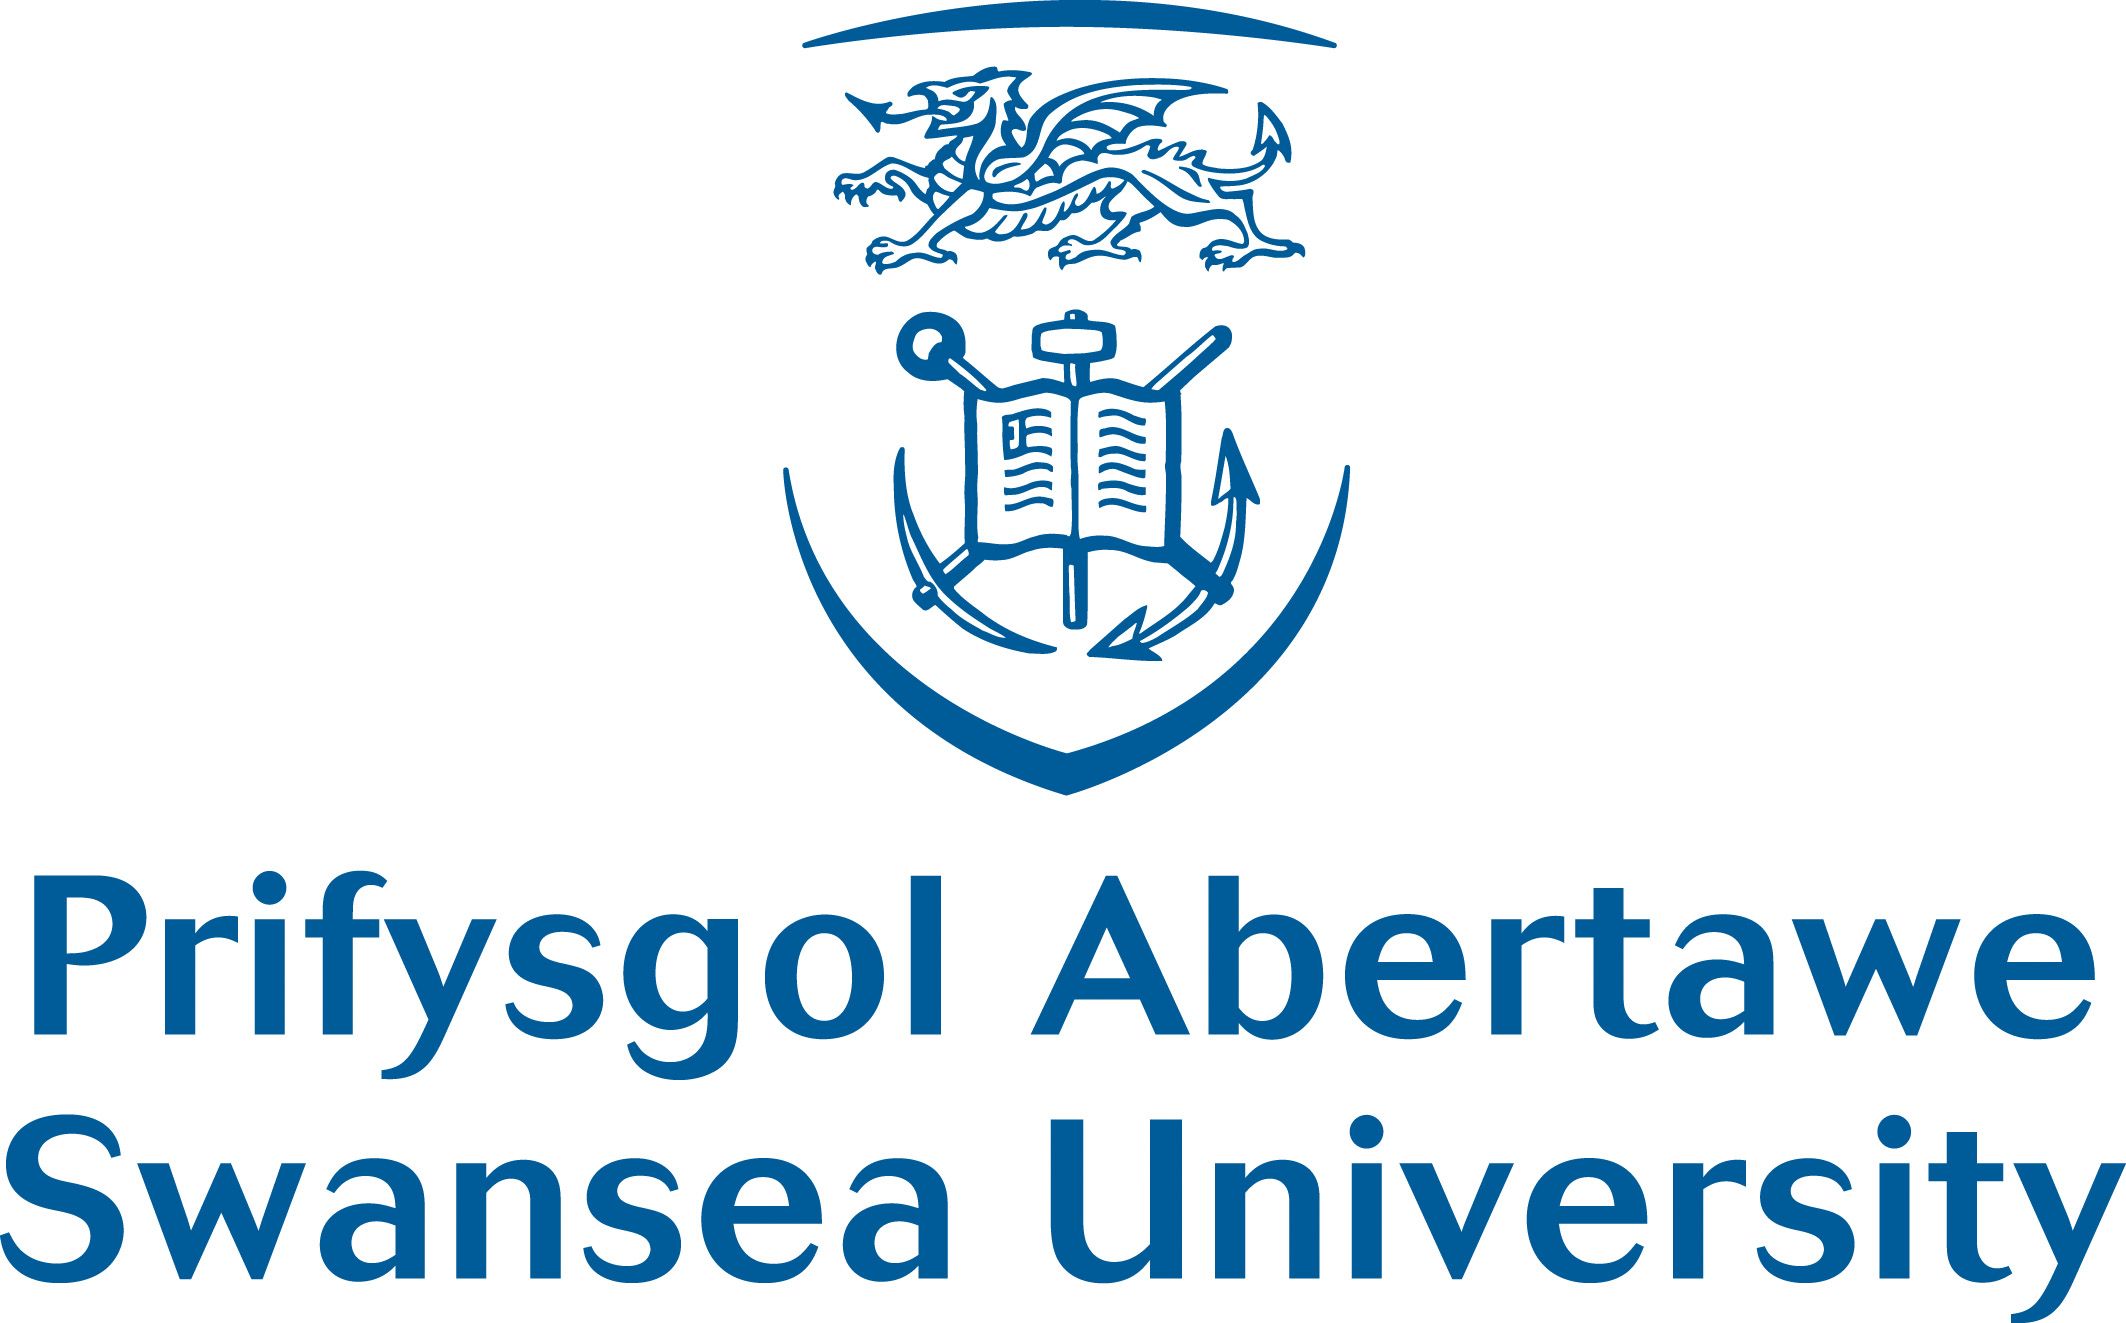 New LowCVP Members: Swansea University